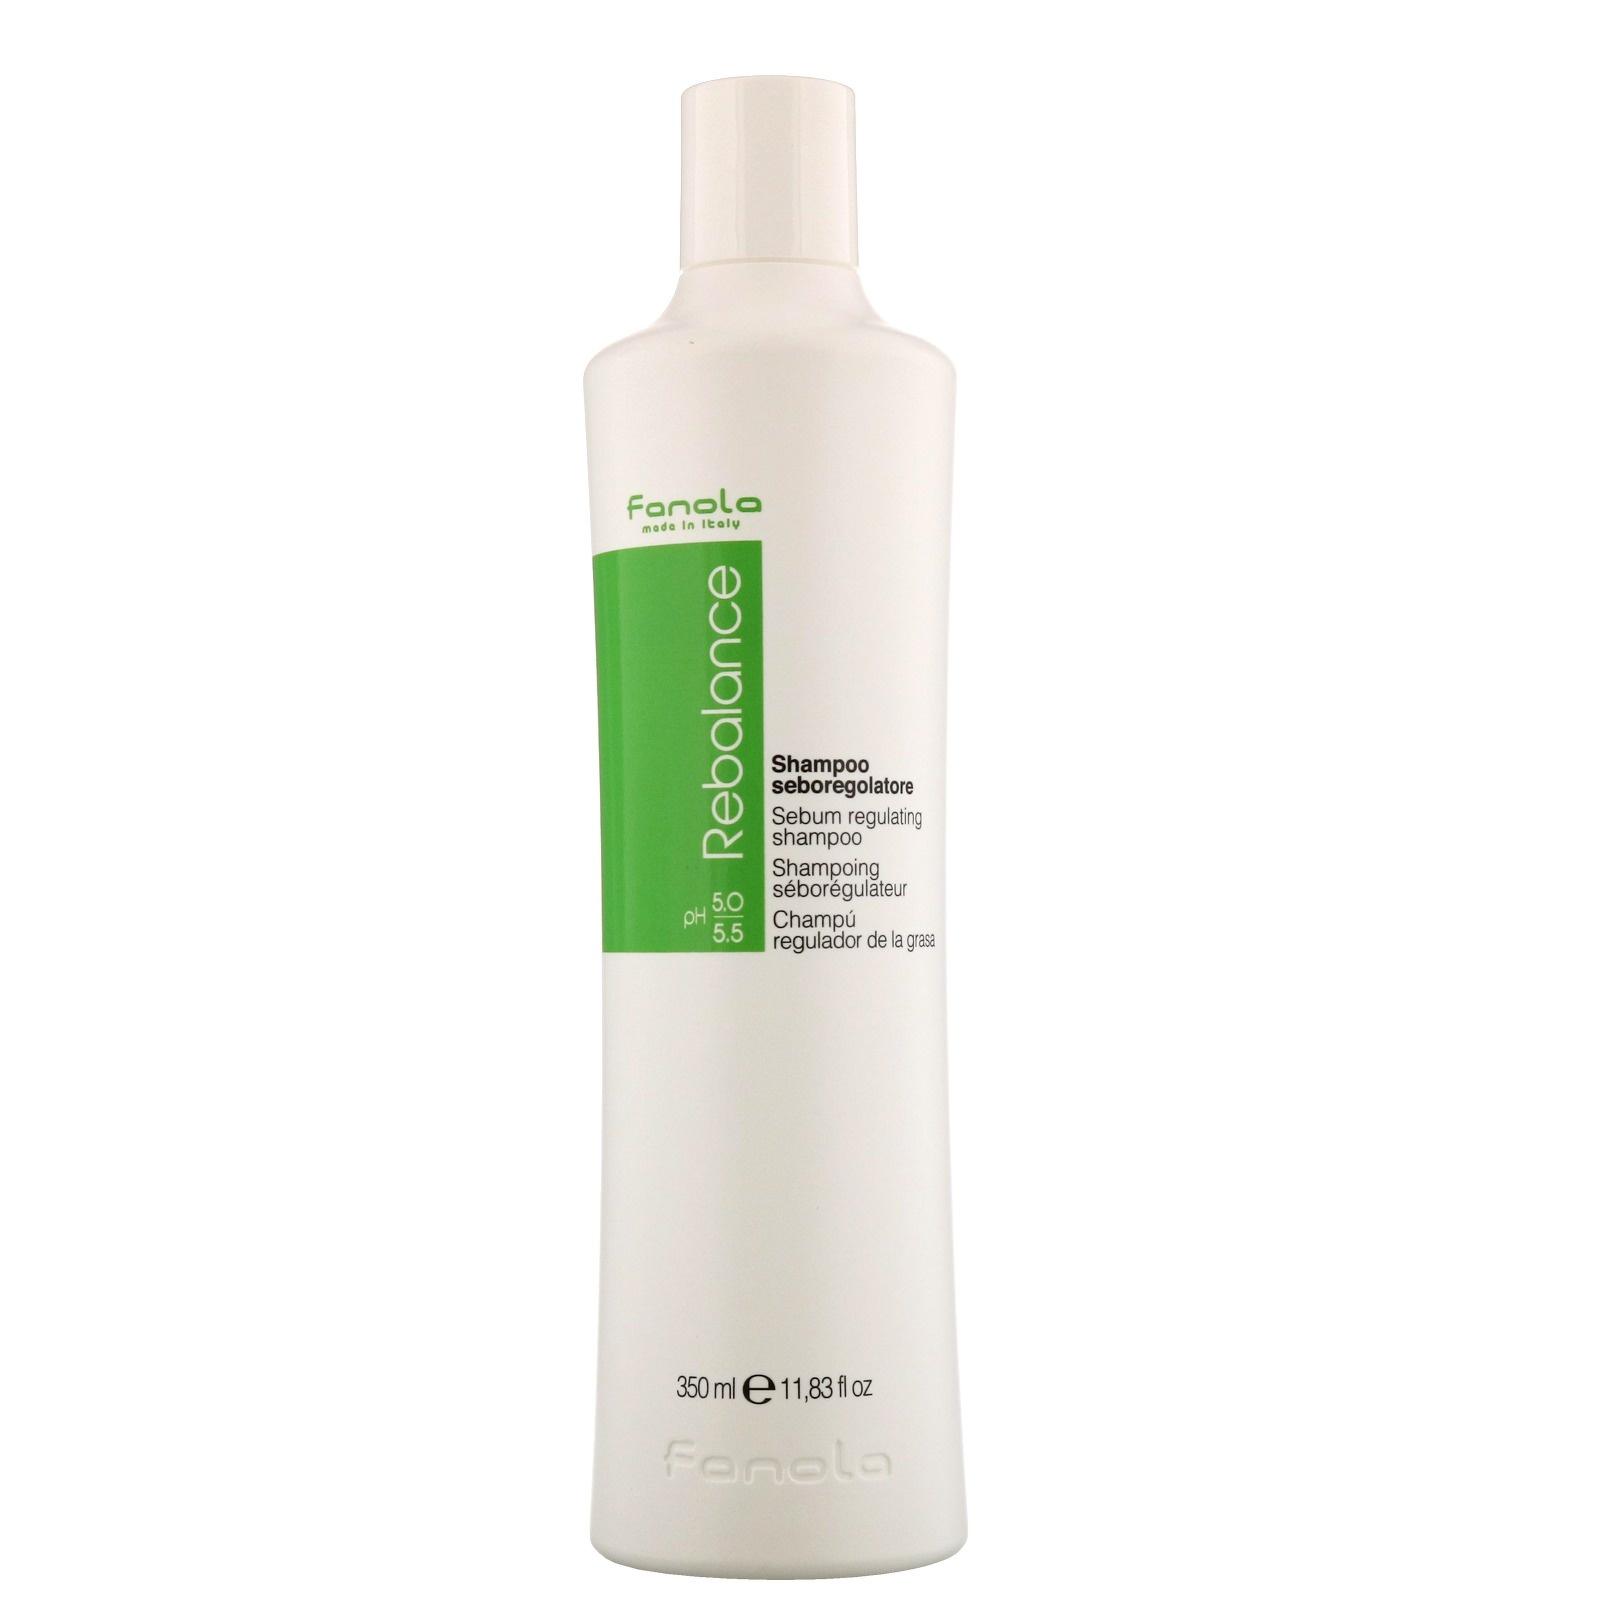 Image result for fanola rebalance shampoo